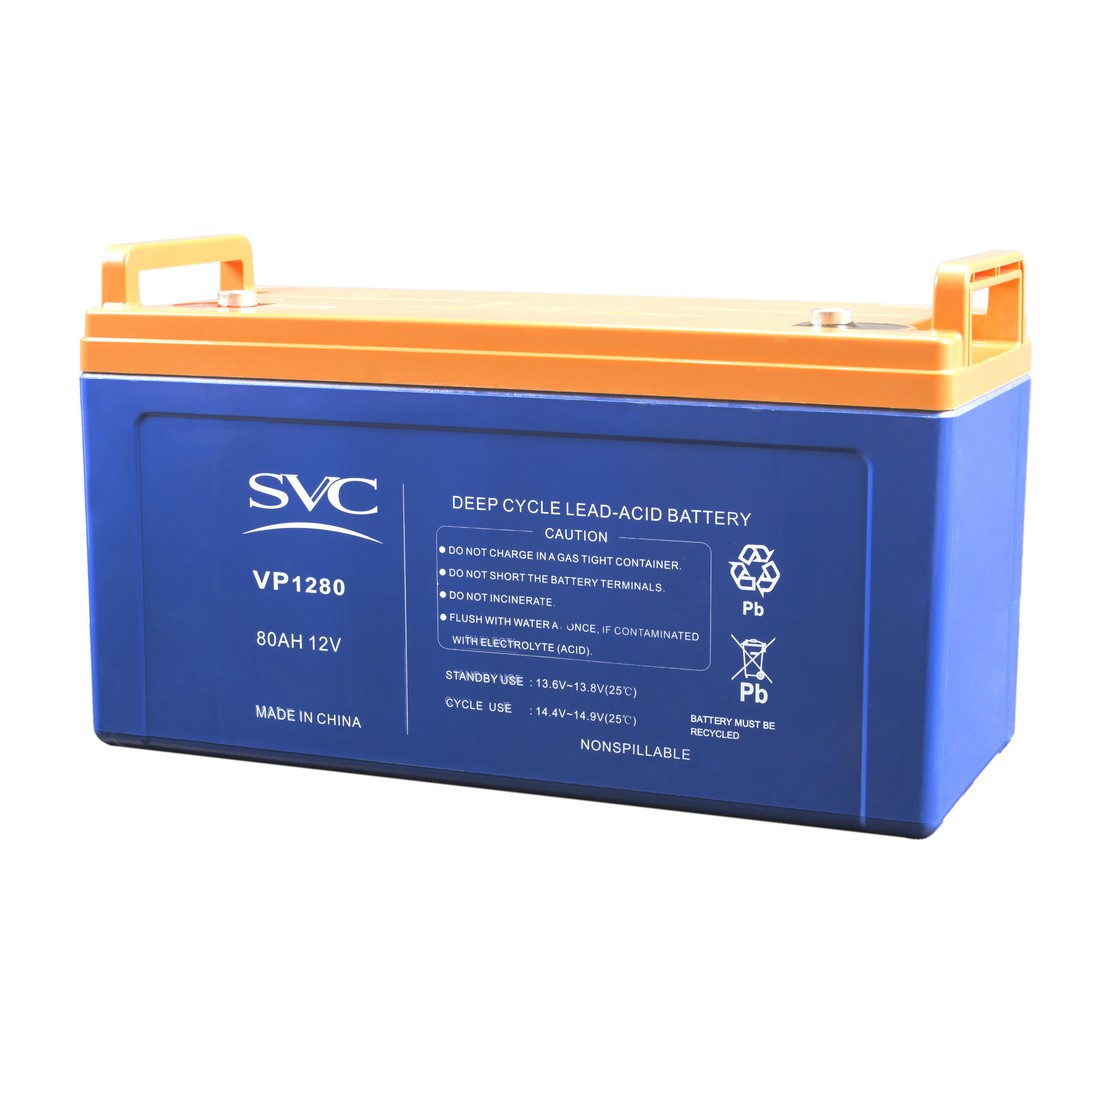 Батарея SVC свинцово-кислотная VP1280 12В 80 Ач